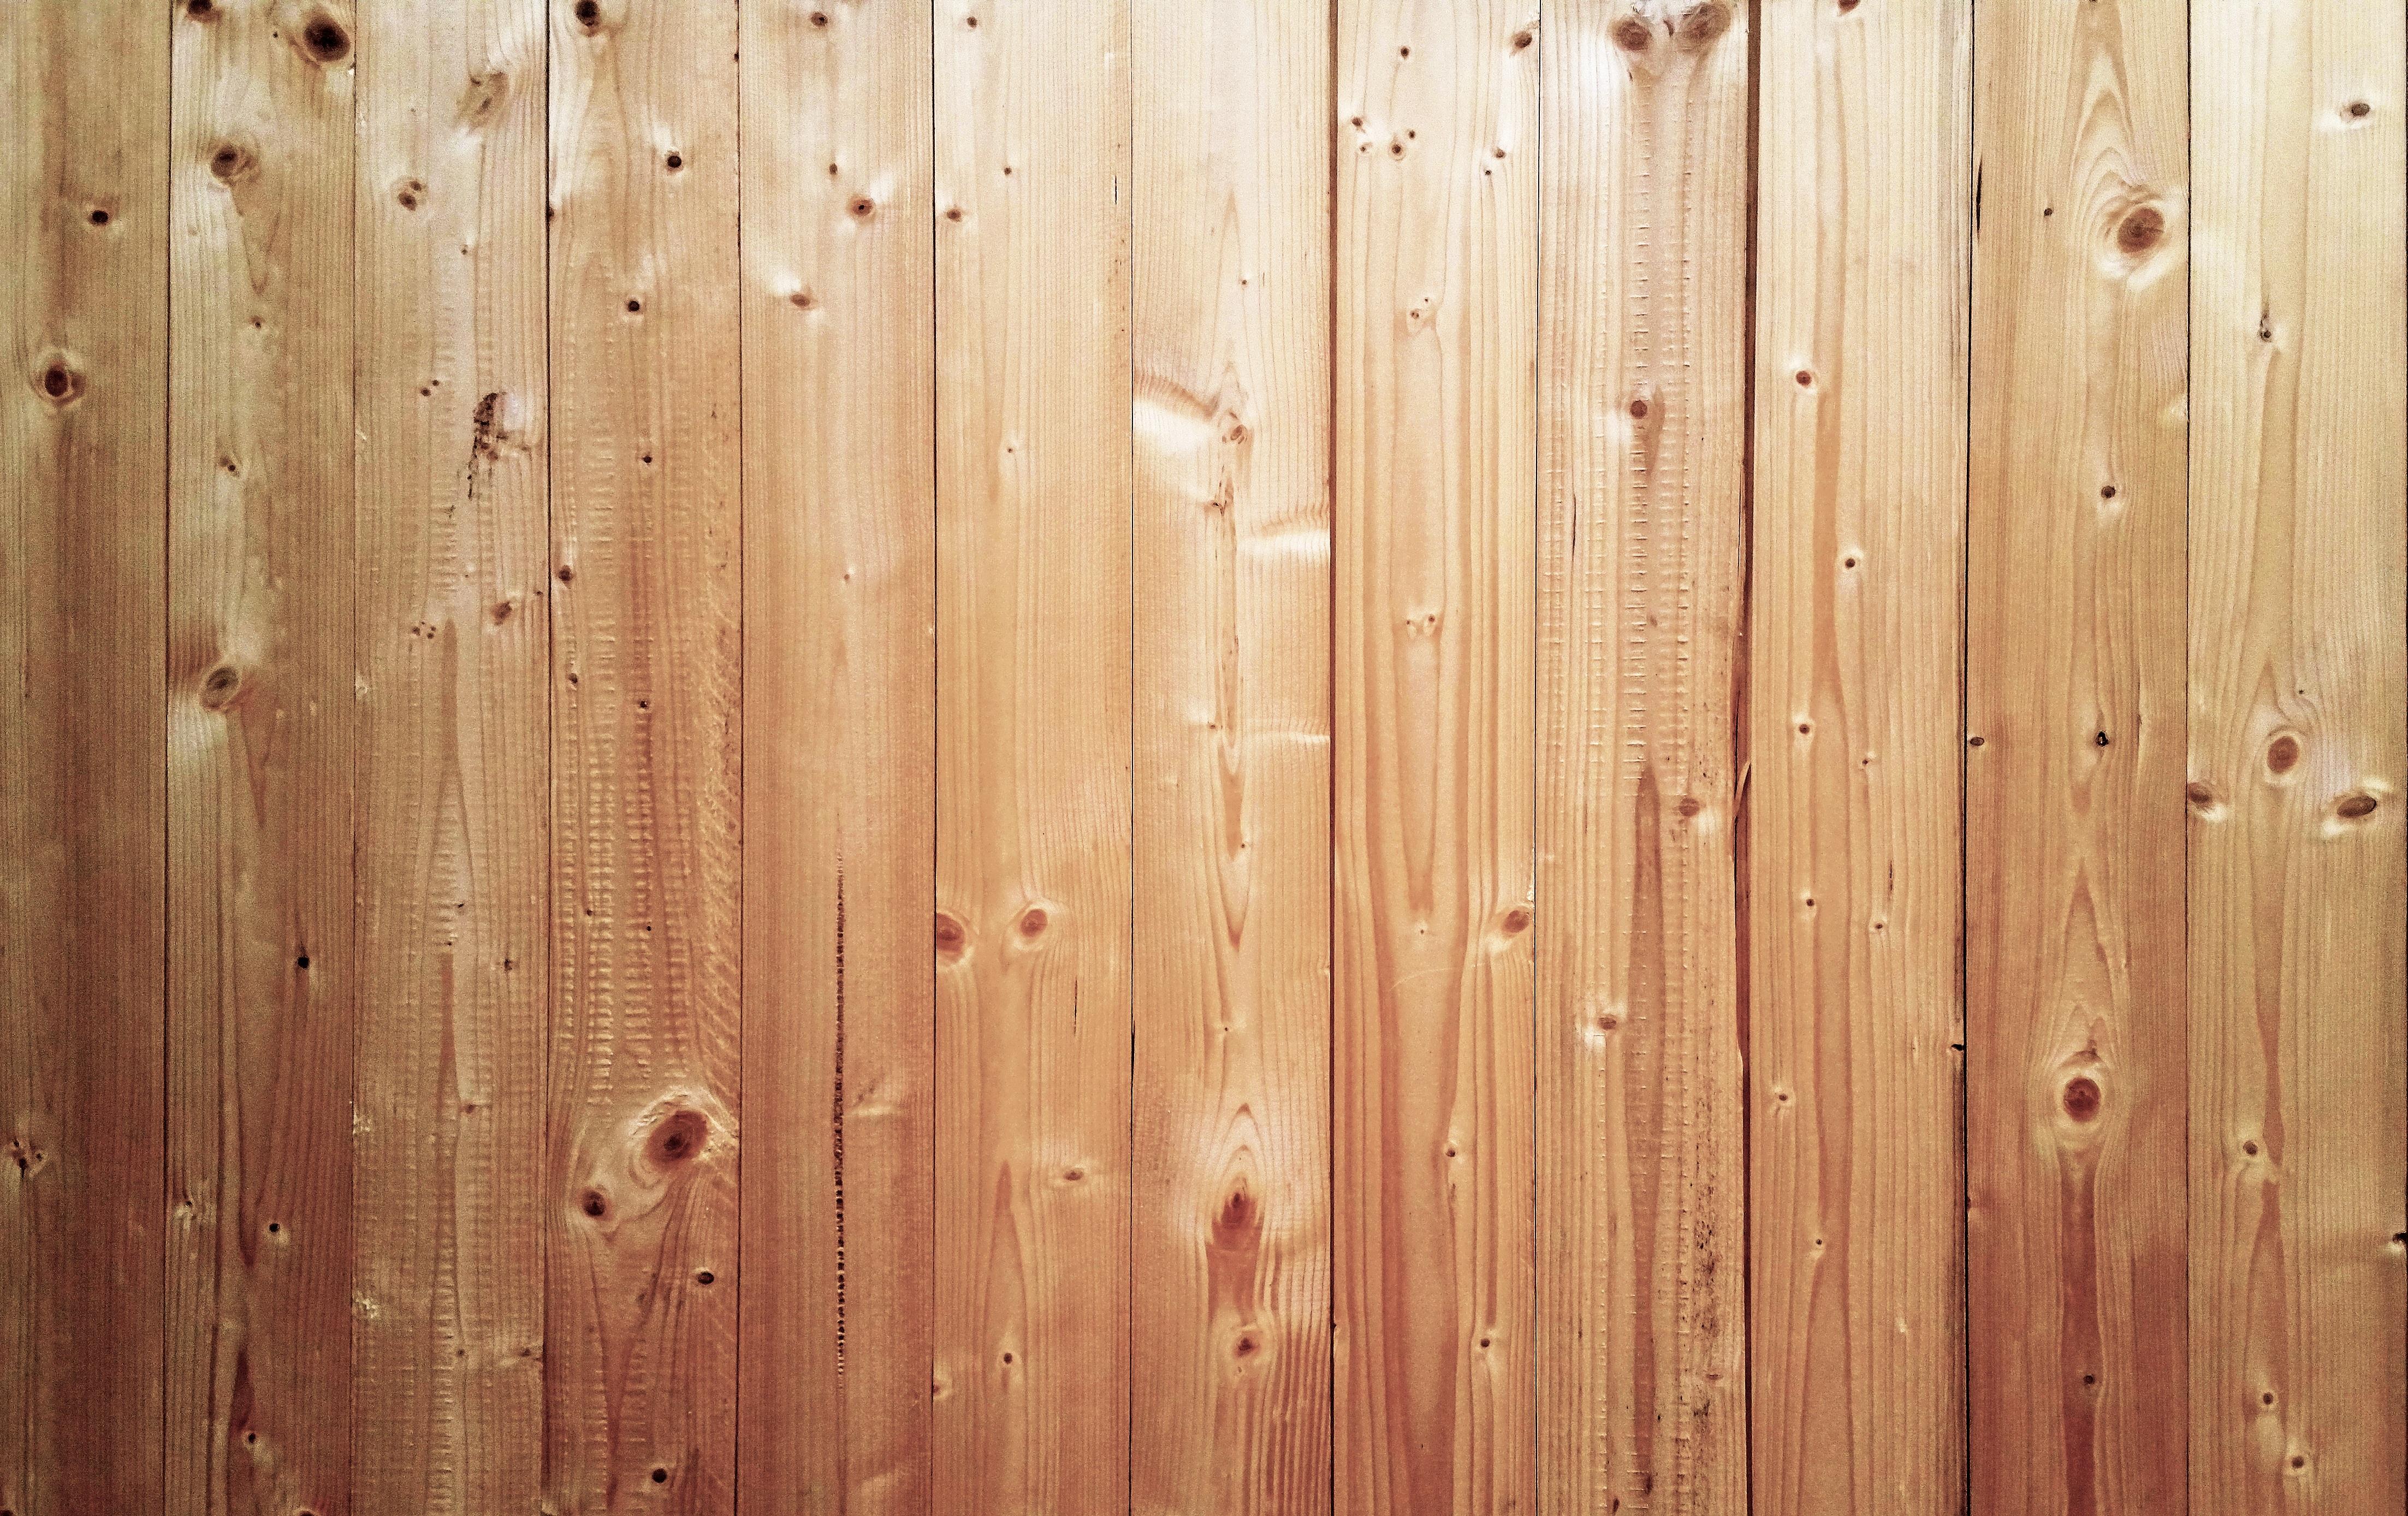 Table Fence Structure Wood Texture Plank Floor Wall Door Background Hardwood Boards Wooden Board Flooring